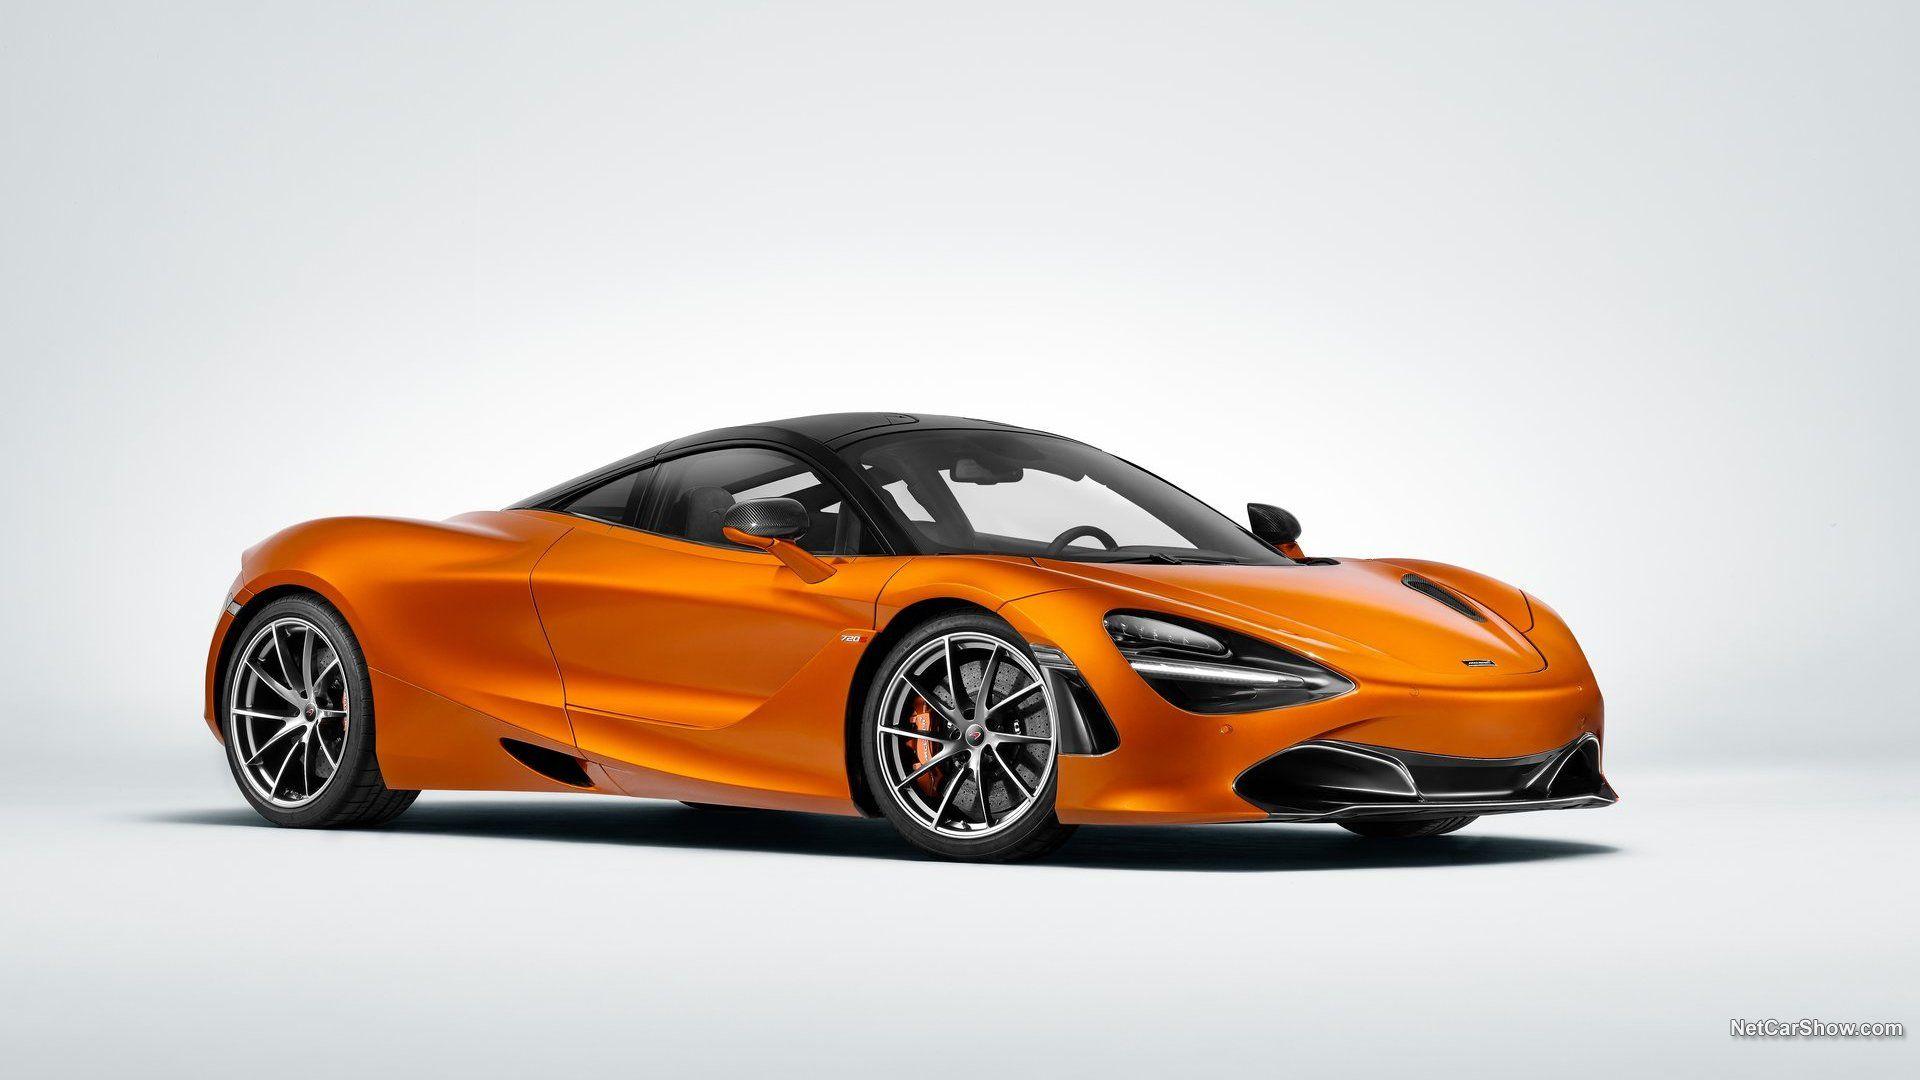 2018 McLaren 720S [1920 x 1080] Need iPhone 6S Plus